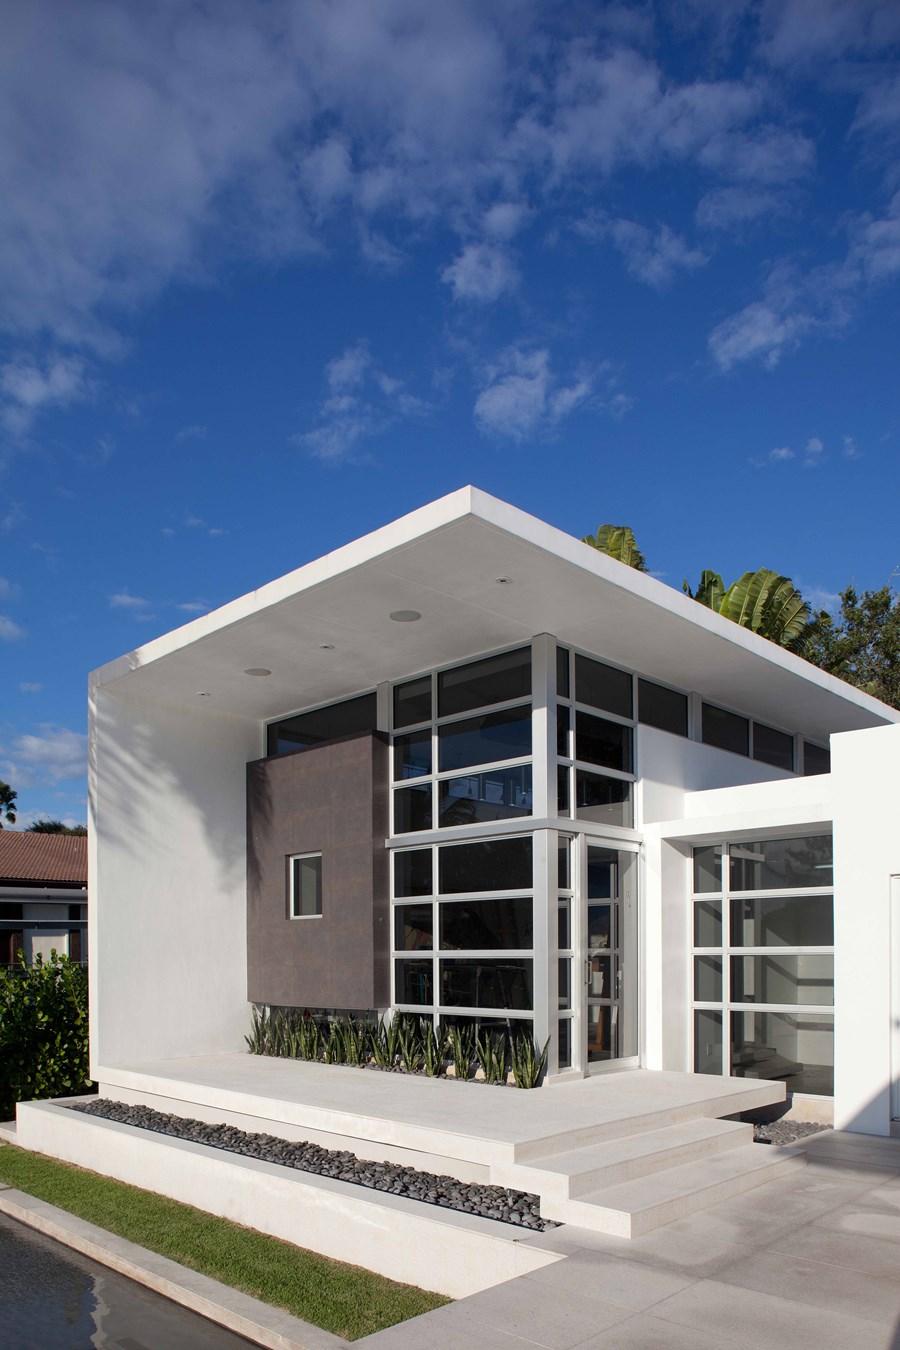 Lakewood Art Studio by KZ Architecture 20